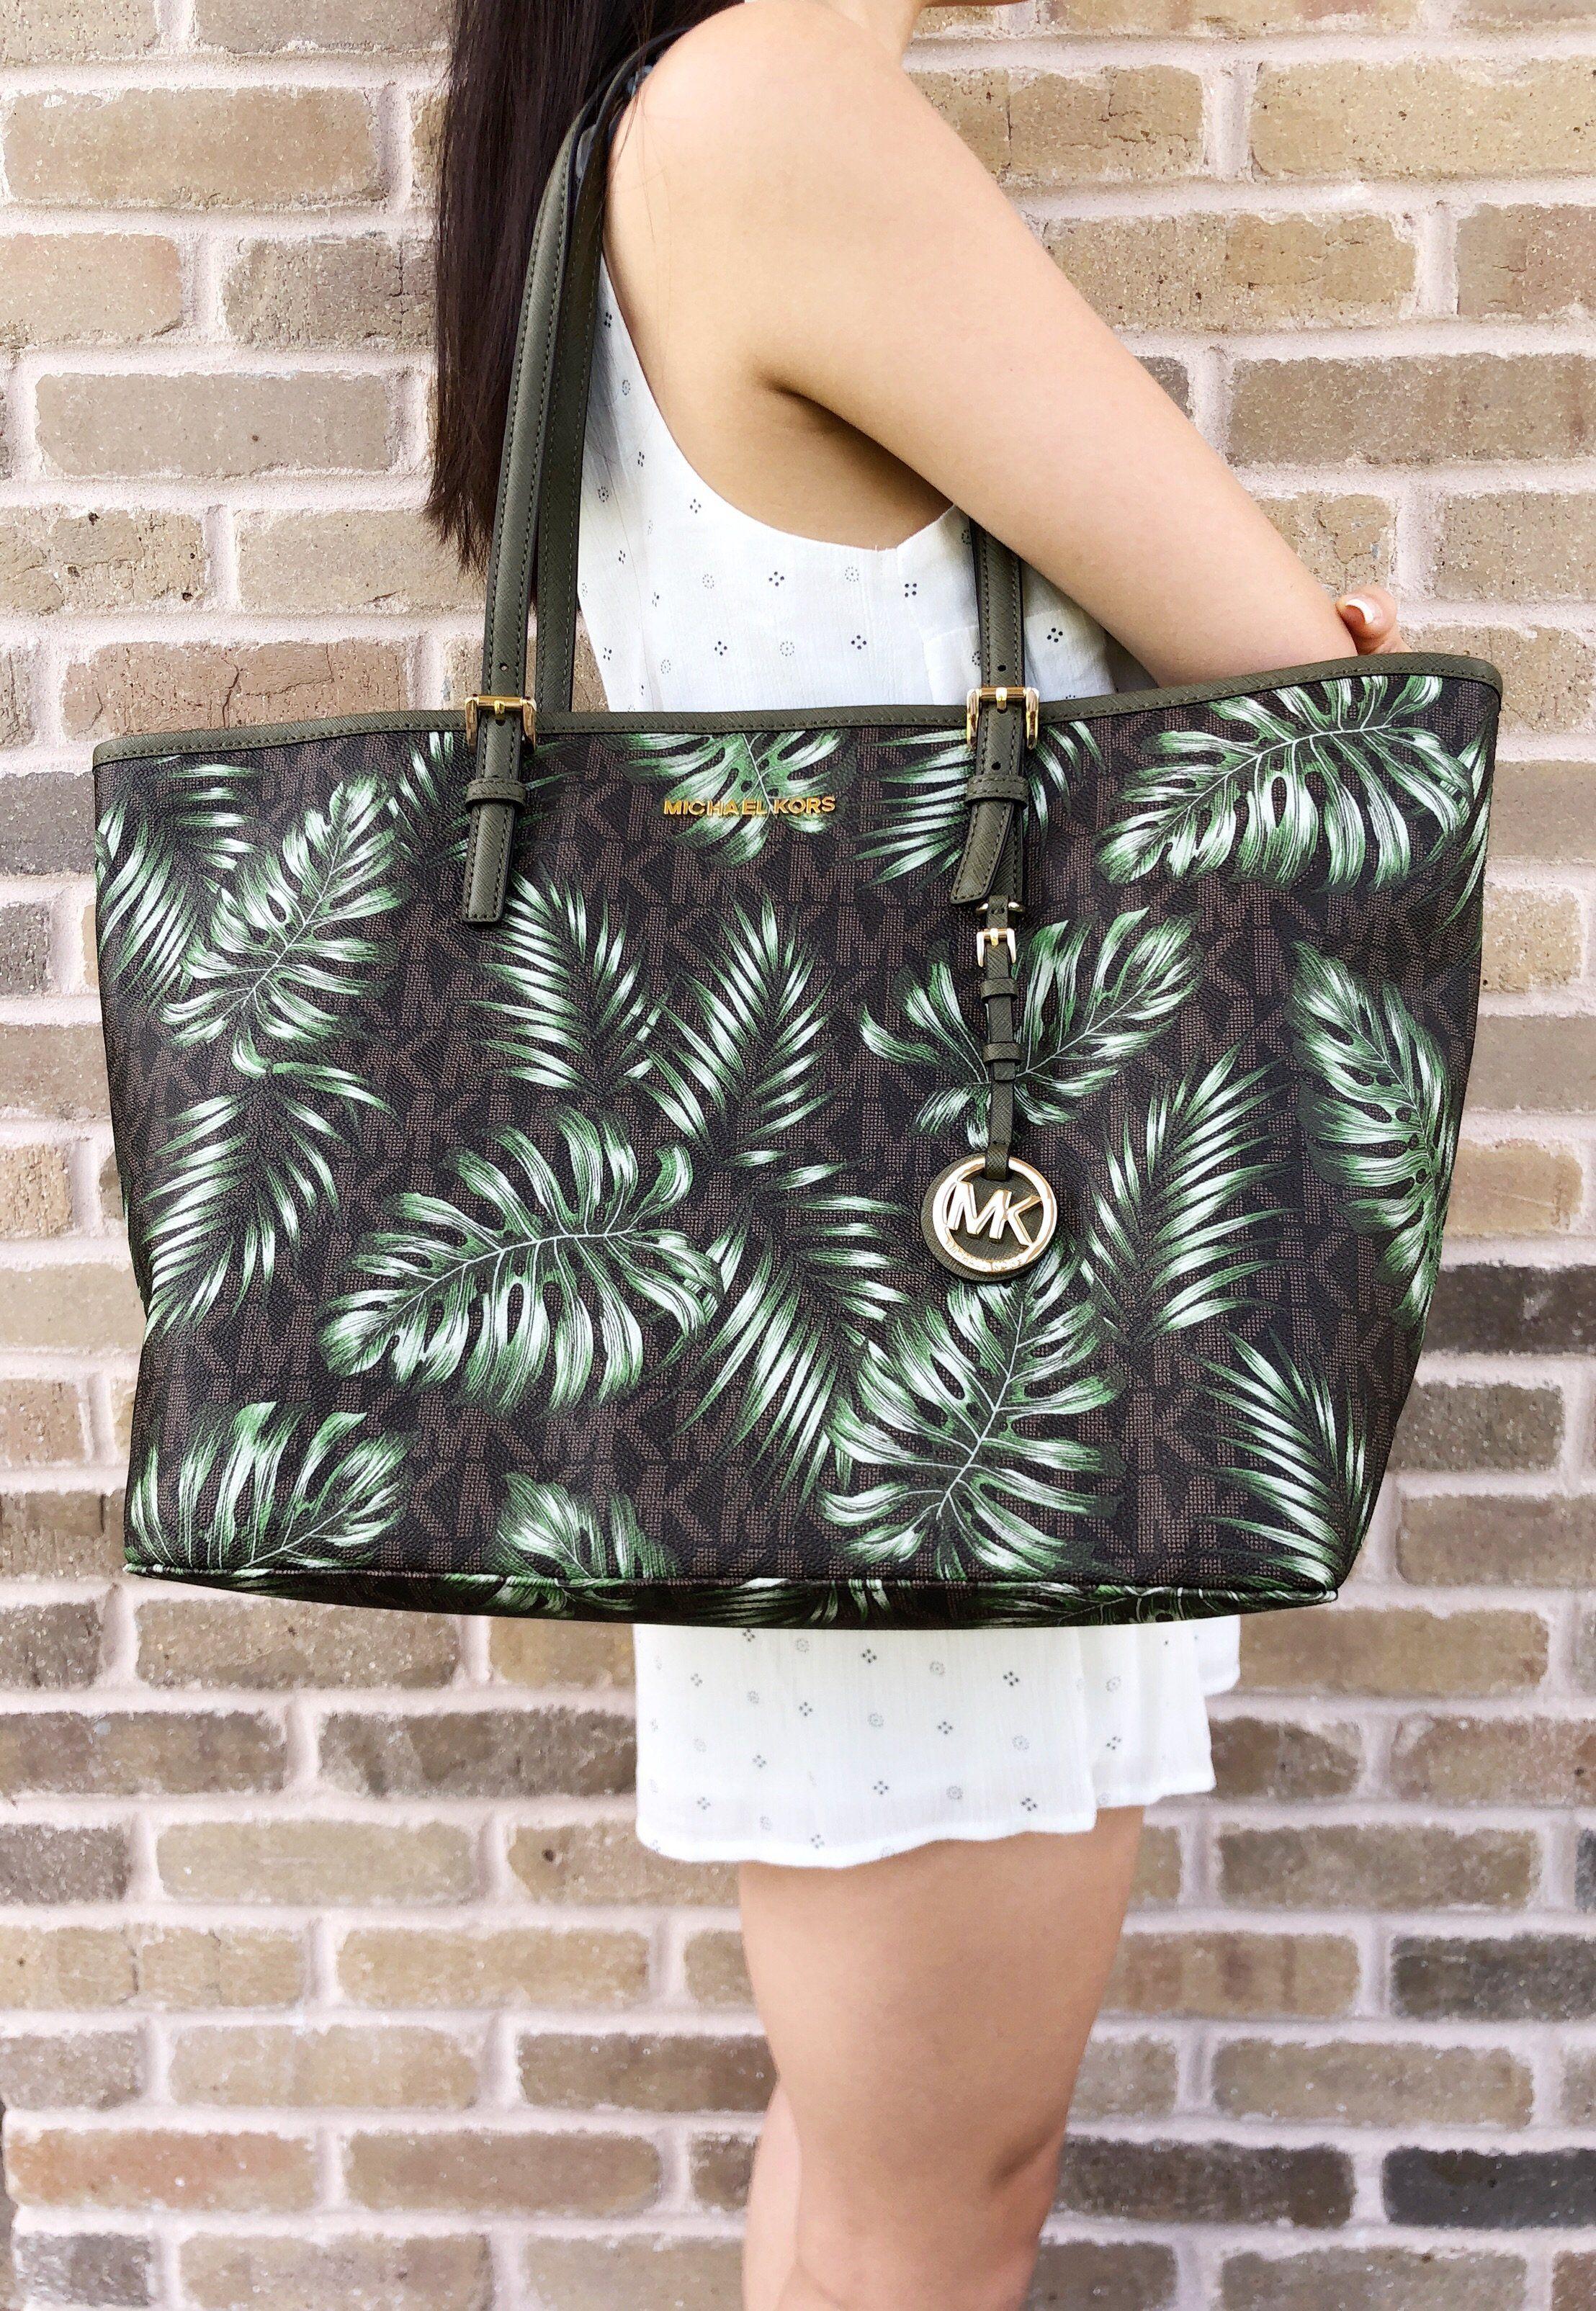 76894be88b22a7 Michael Kors Jet Set Travel Large Carryall Tote Brown MK Olive Green Palm  Leaves #MK #ebayseller #ebayreseller #poshmark #ebaycommunity #tradesy ...